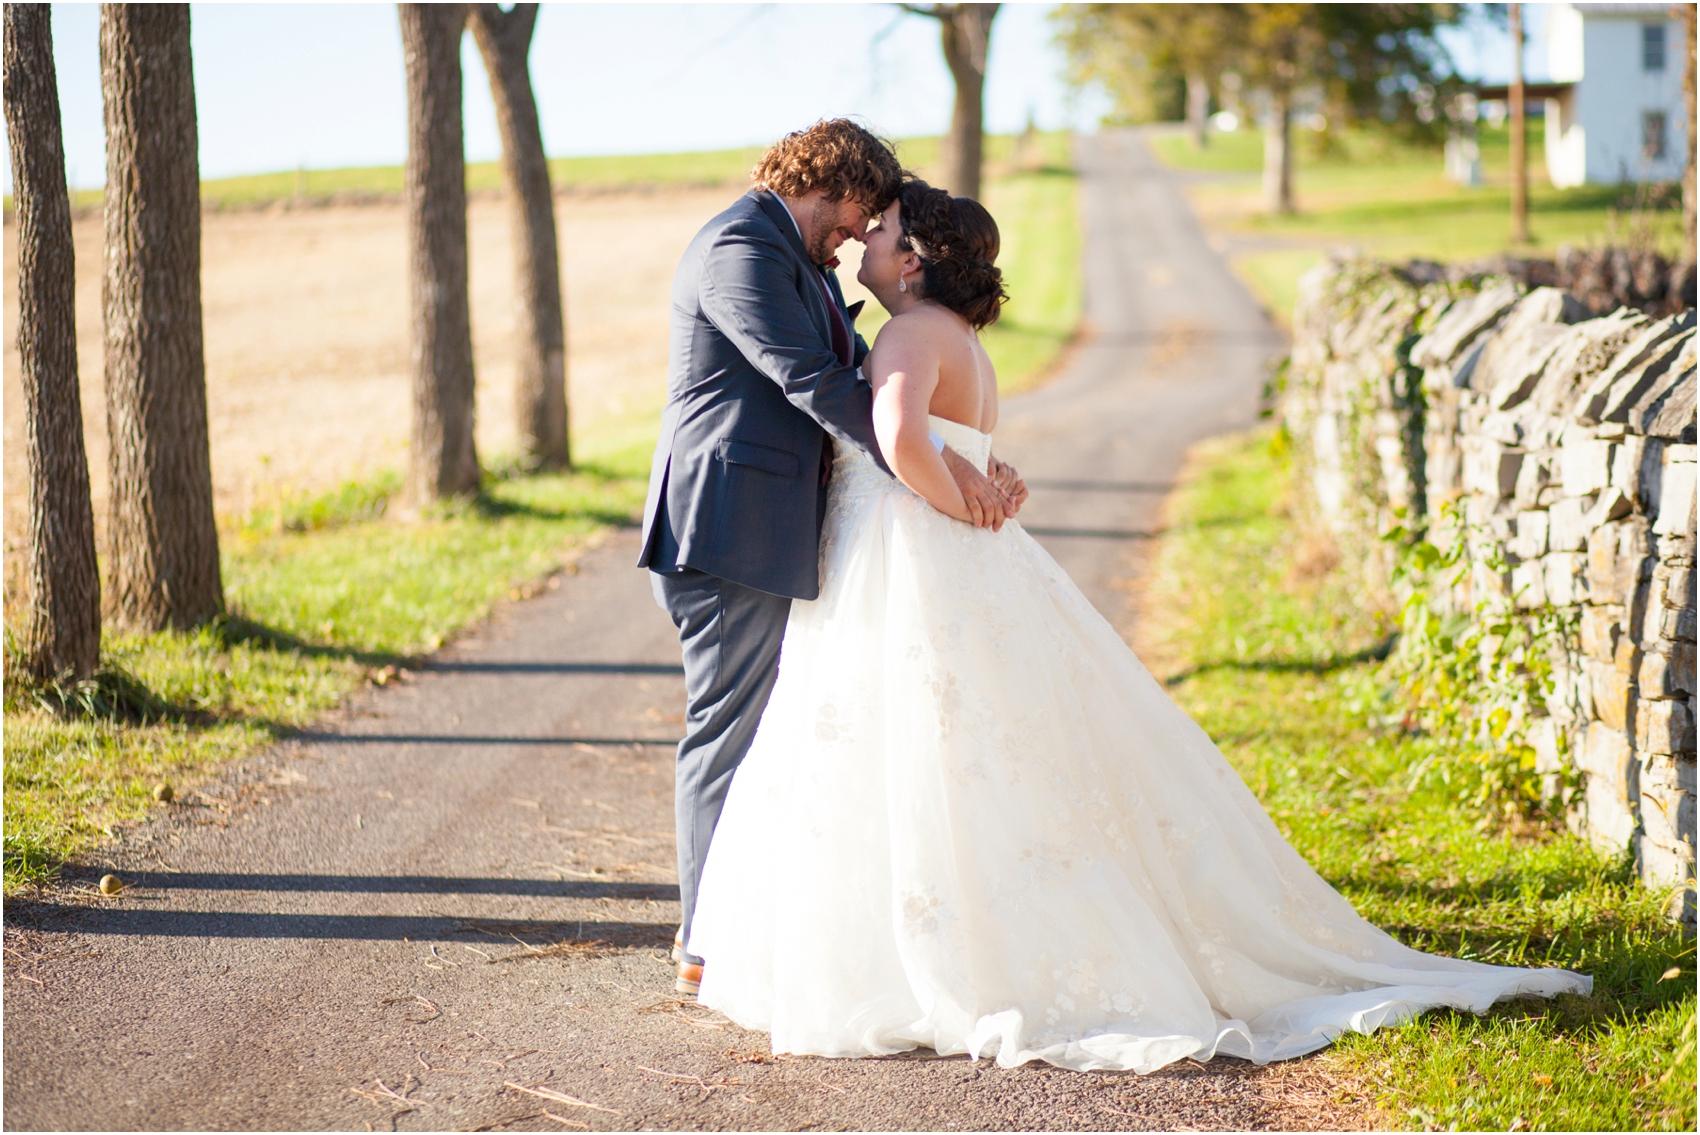 On-Sunny-Slope-Farm-Fall-Virginia-Wedding-3046.jpg